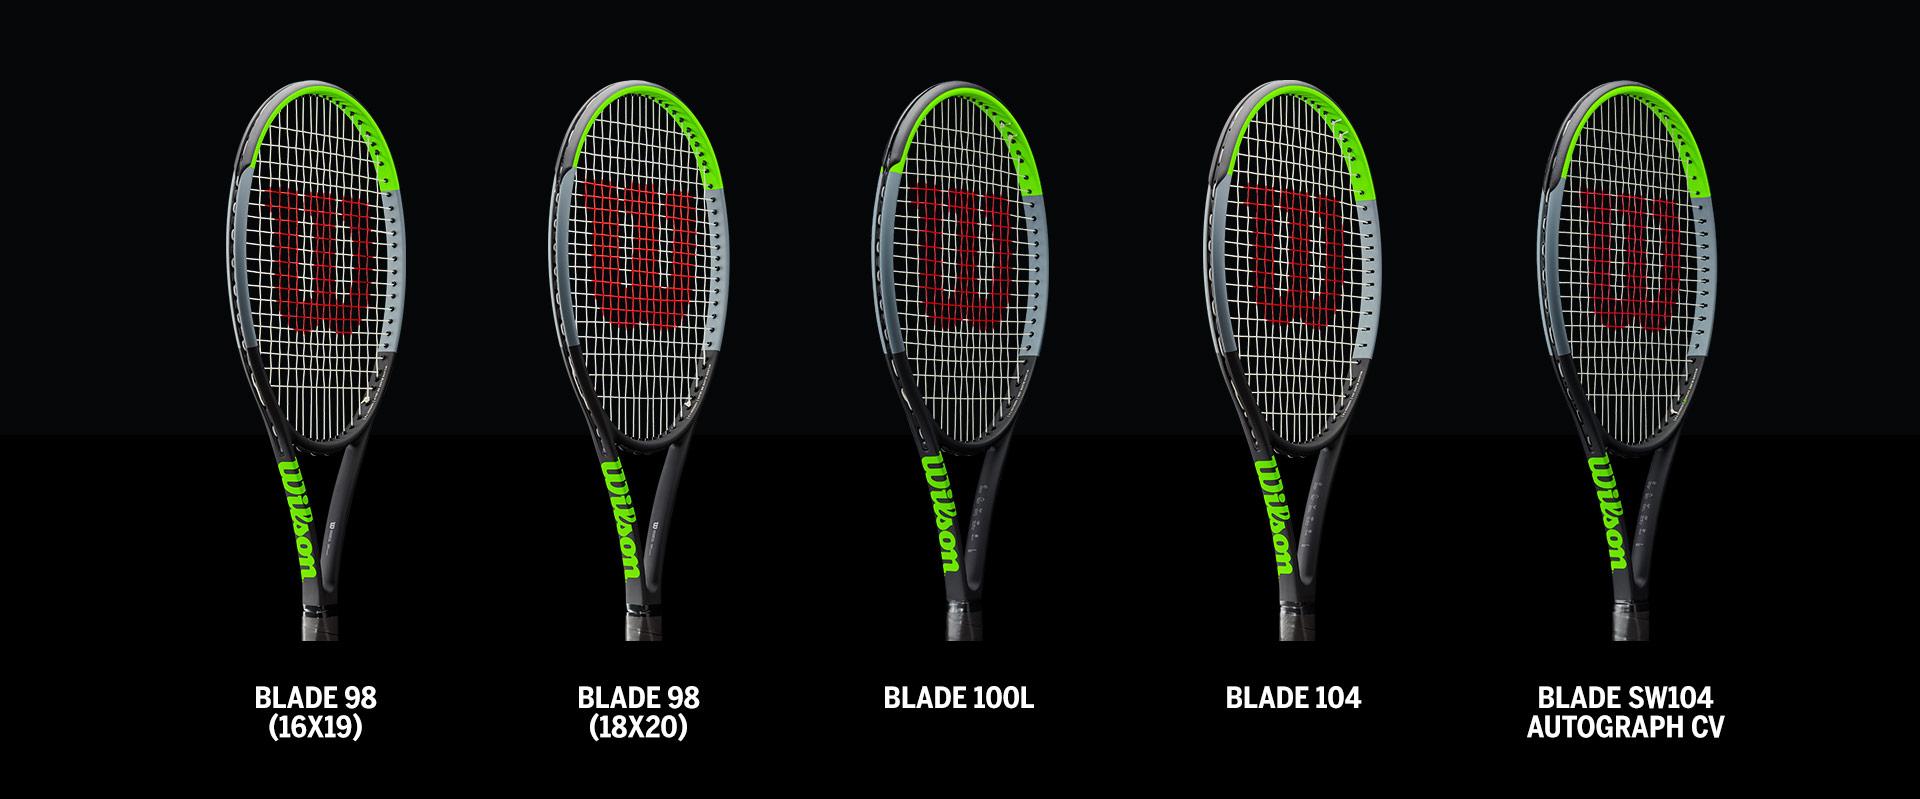 Wilson v7 Blade series